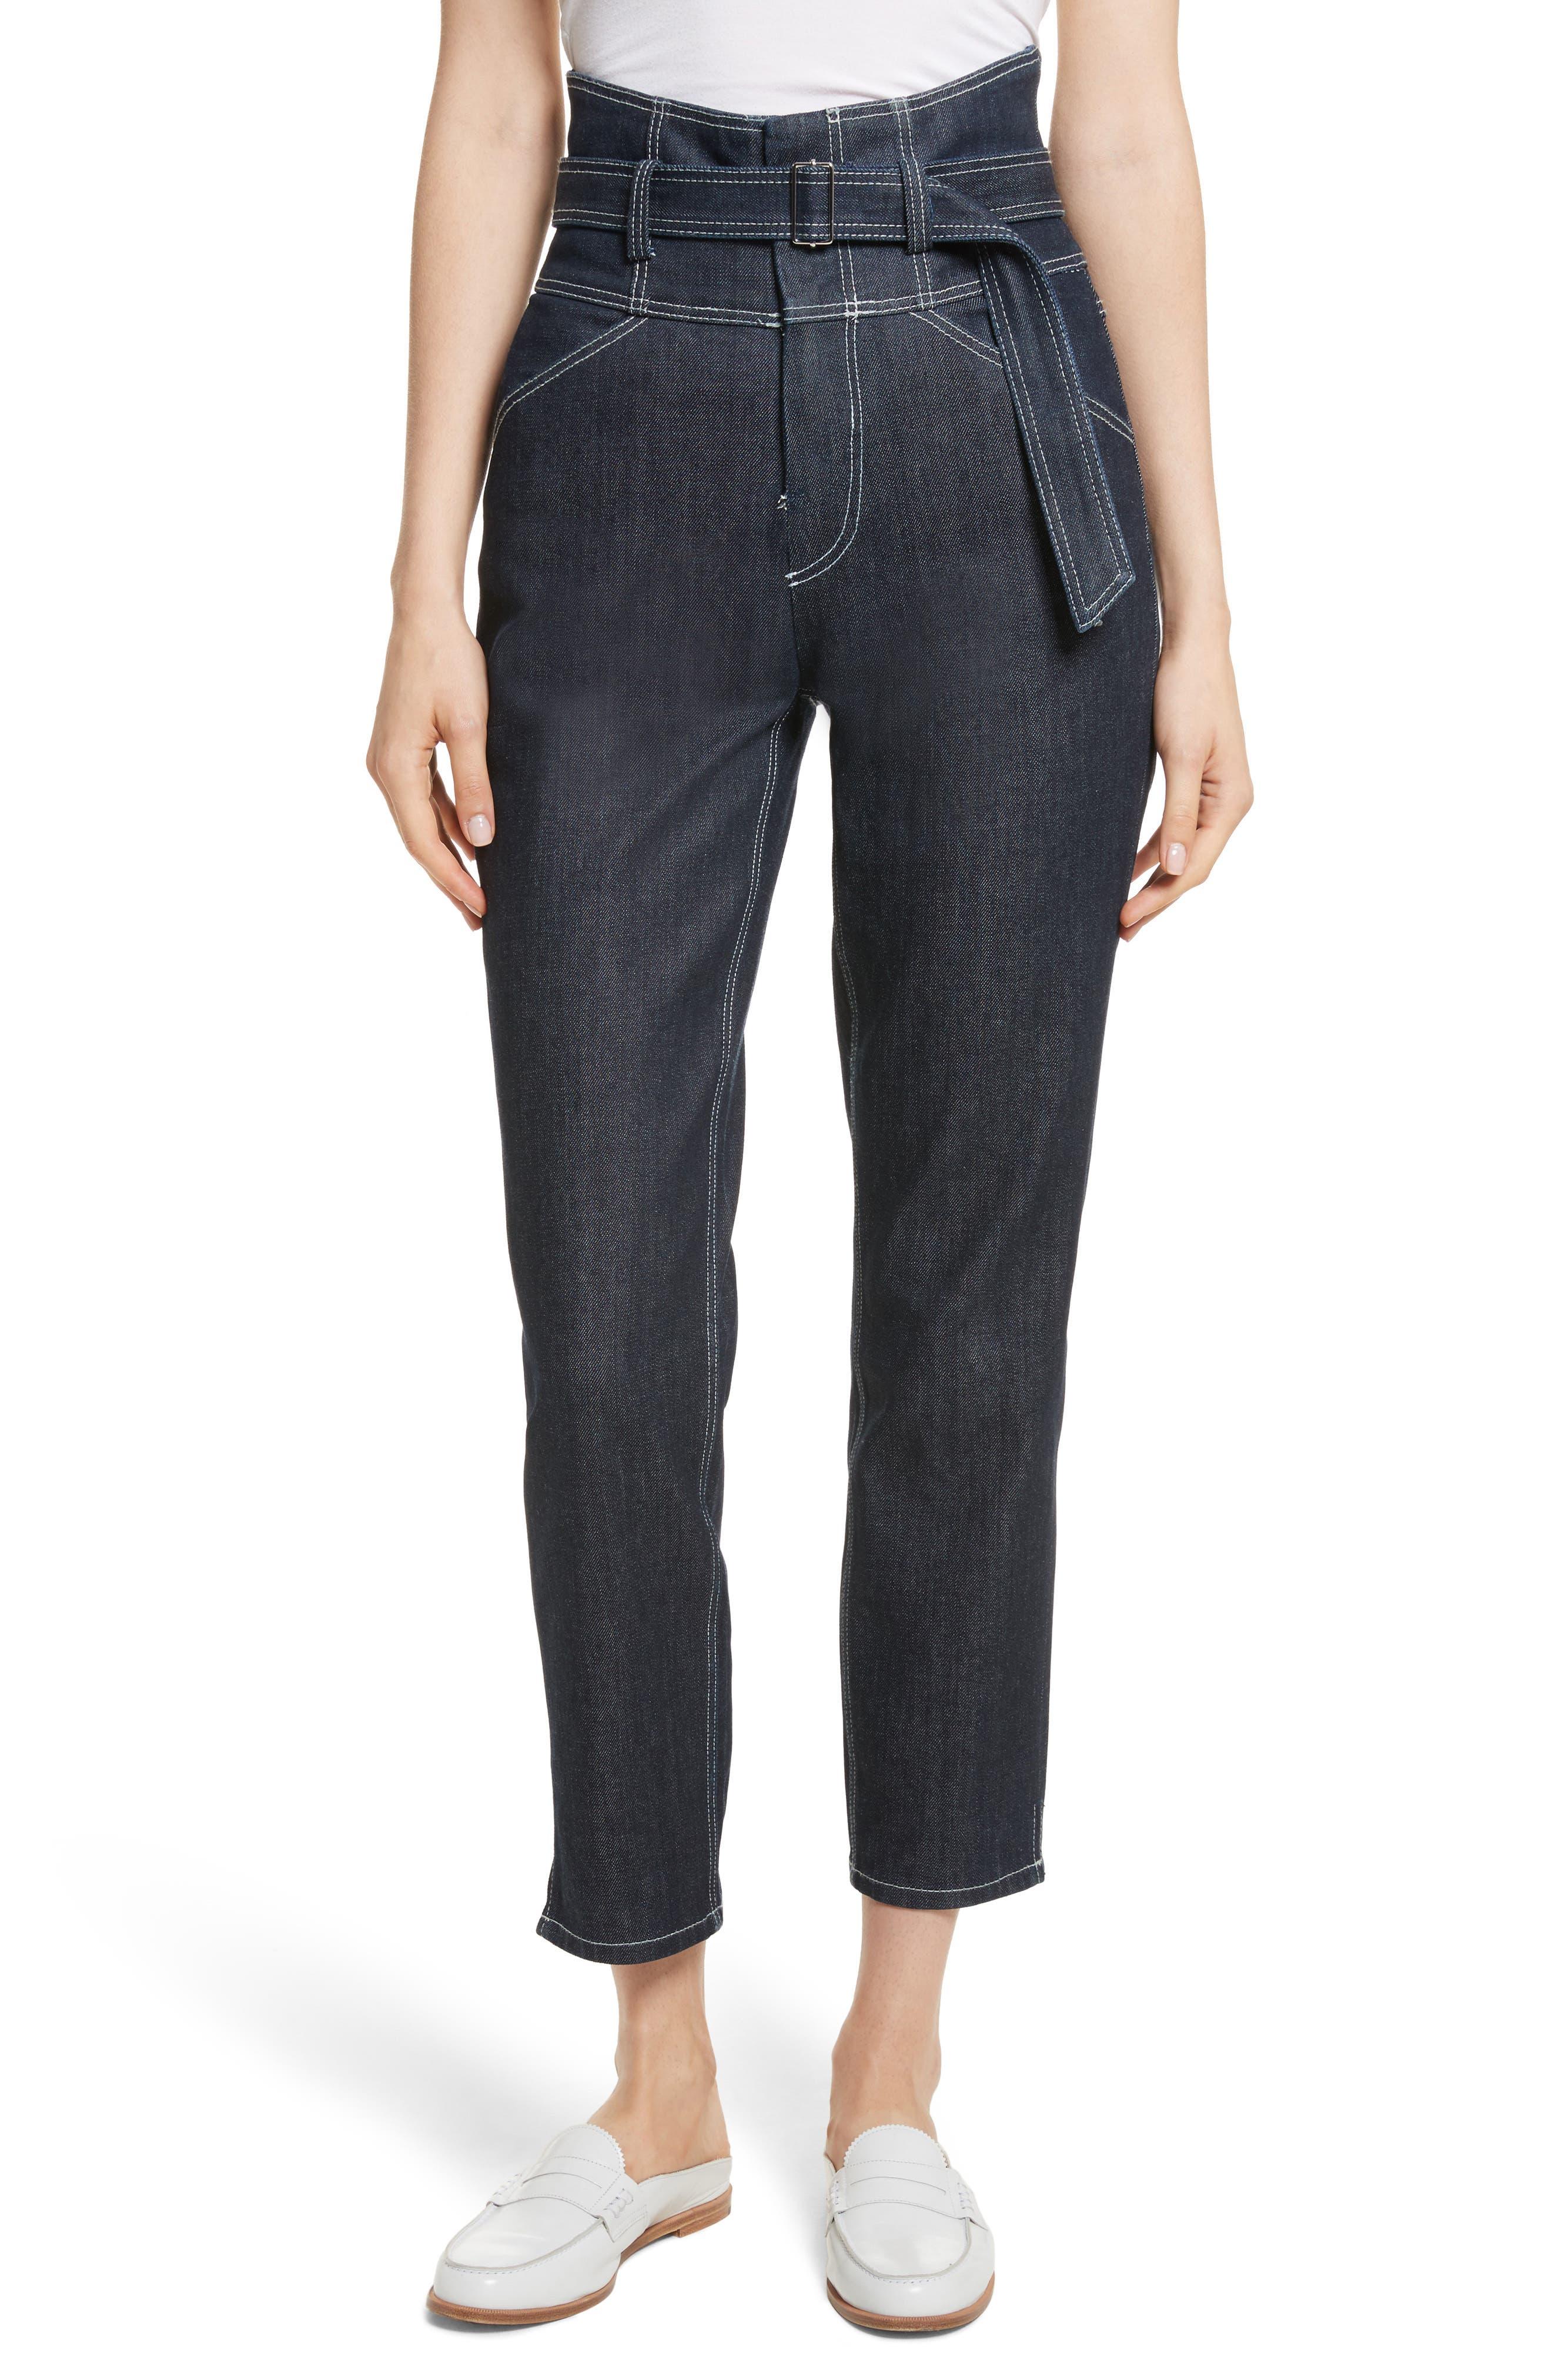 La Vie Rebecca Taylor Belted Crop Jeans